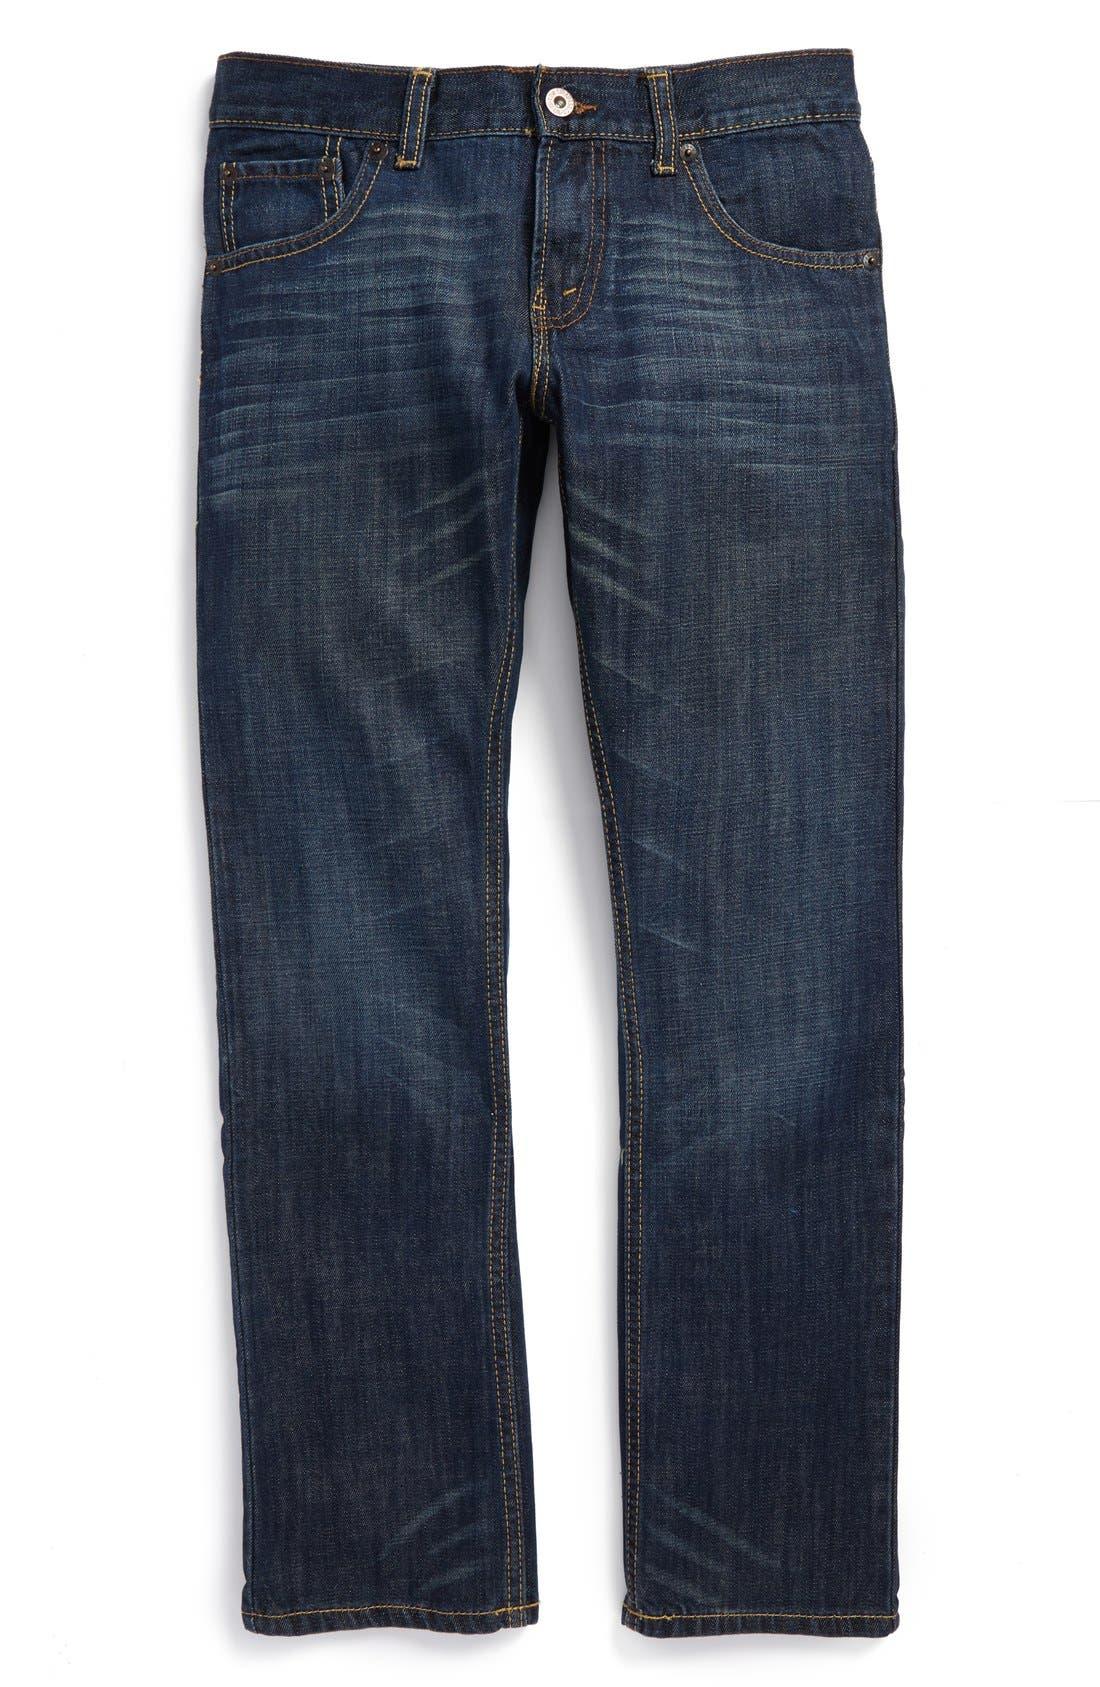 Alternate Image 1 Selected - Levi's® '513™' Slim Straight Jeans (Big Boys)